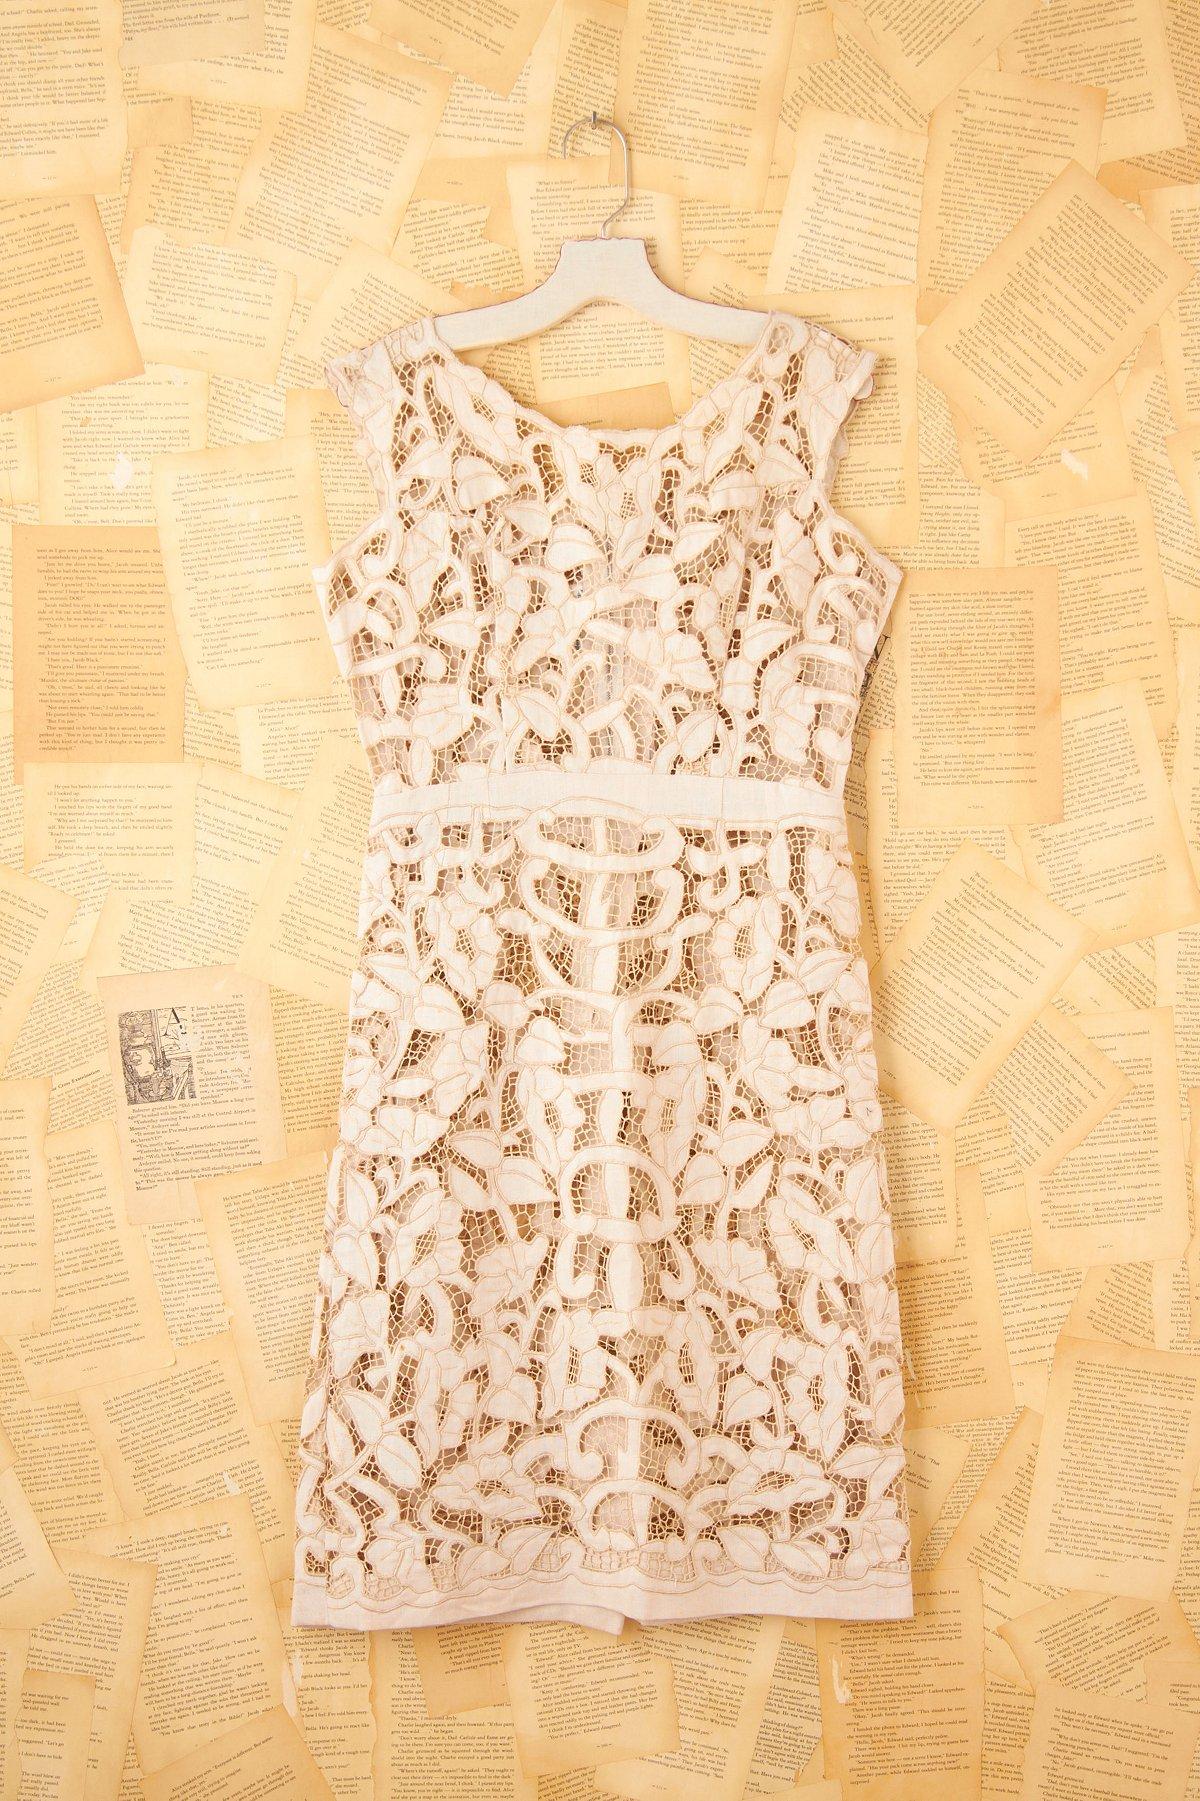 Vintage 1980s Sheer Lace Dress